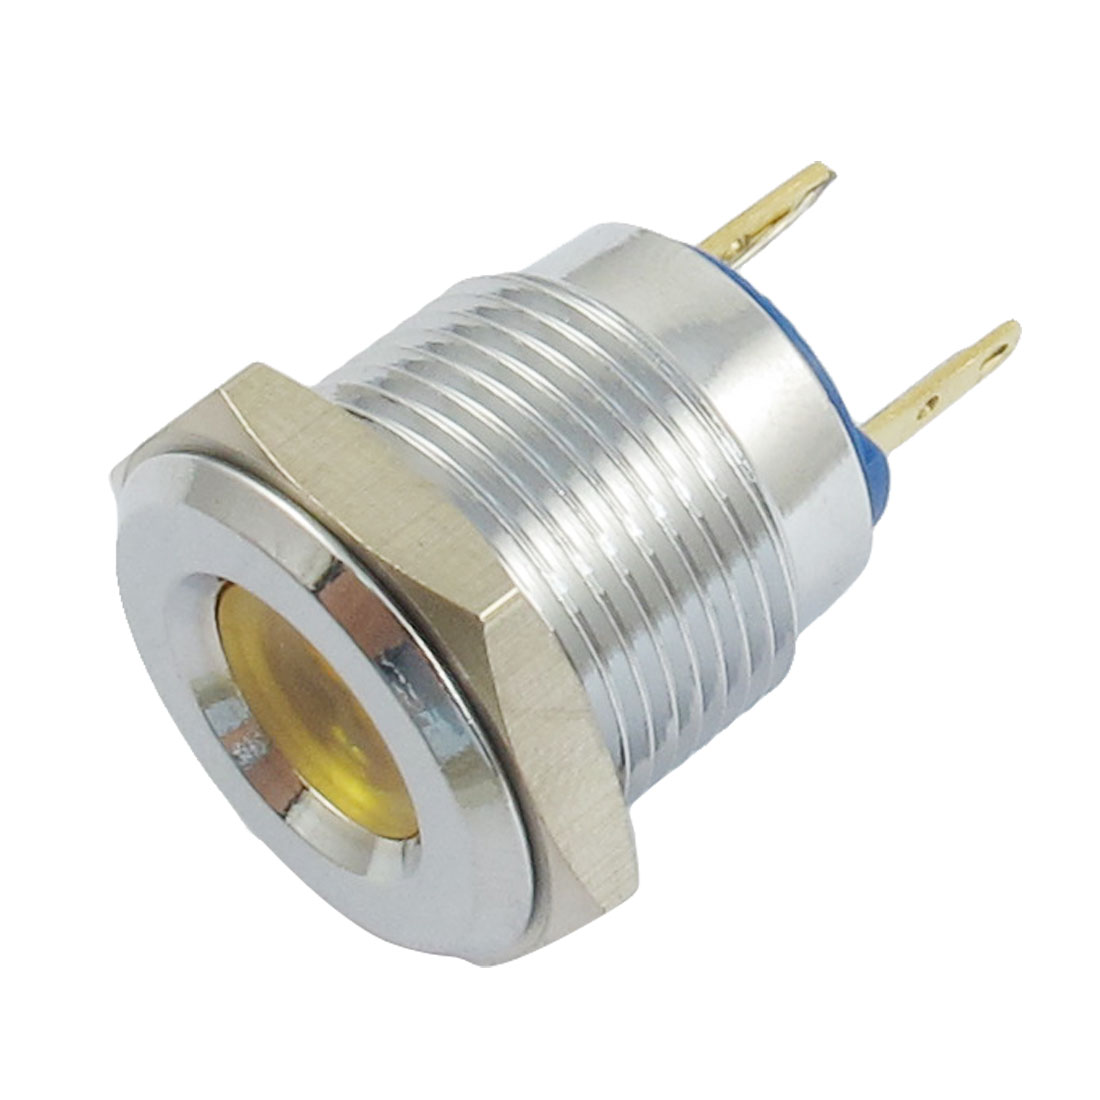 MQ16 Model DC 12V Two Terminals Yellow Light Signal Indicator Pilot Lamp